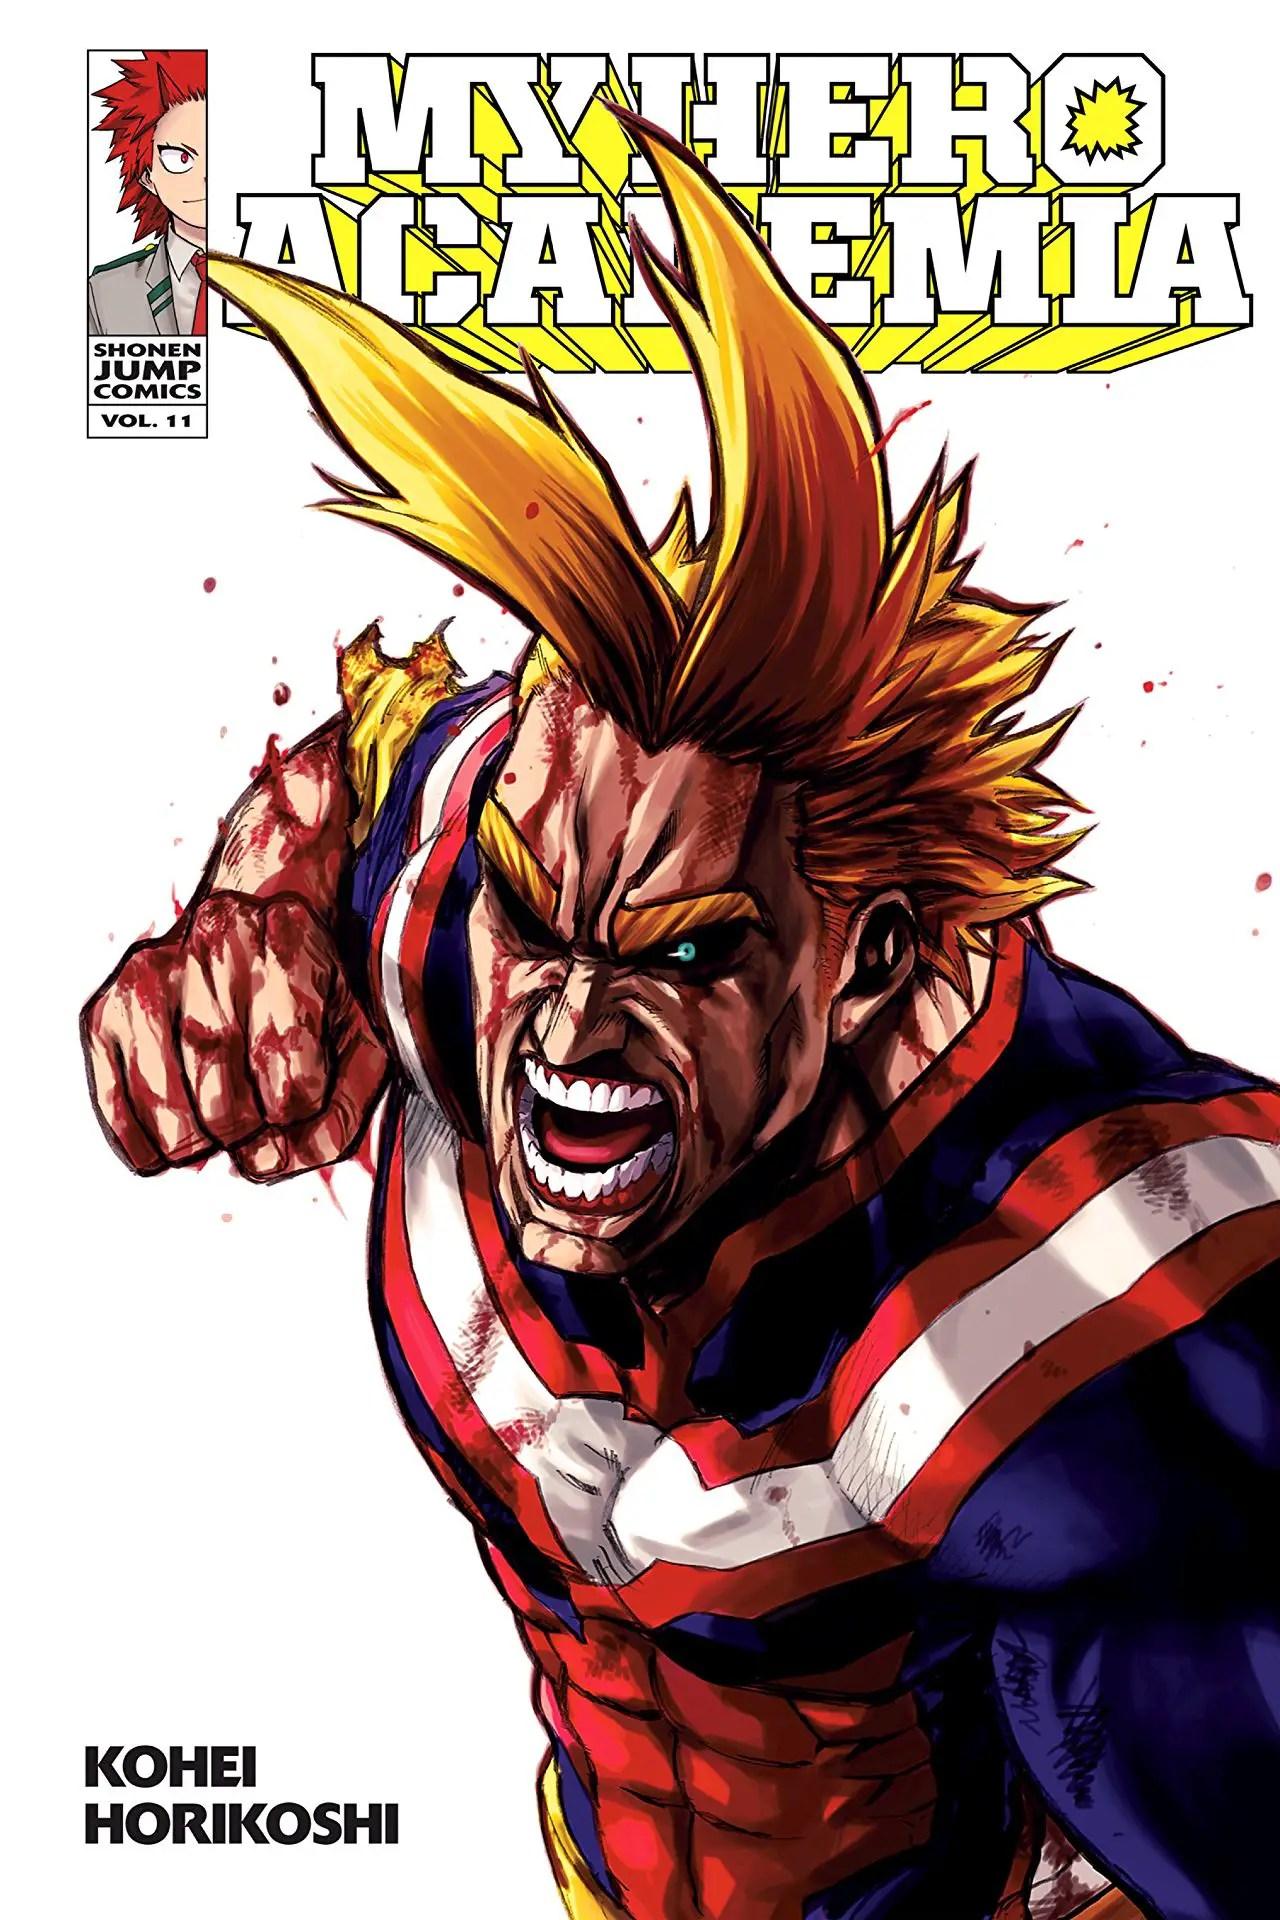 My Hero Academia Vol. 11 Review